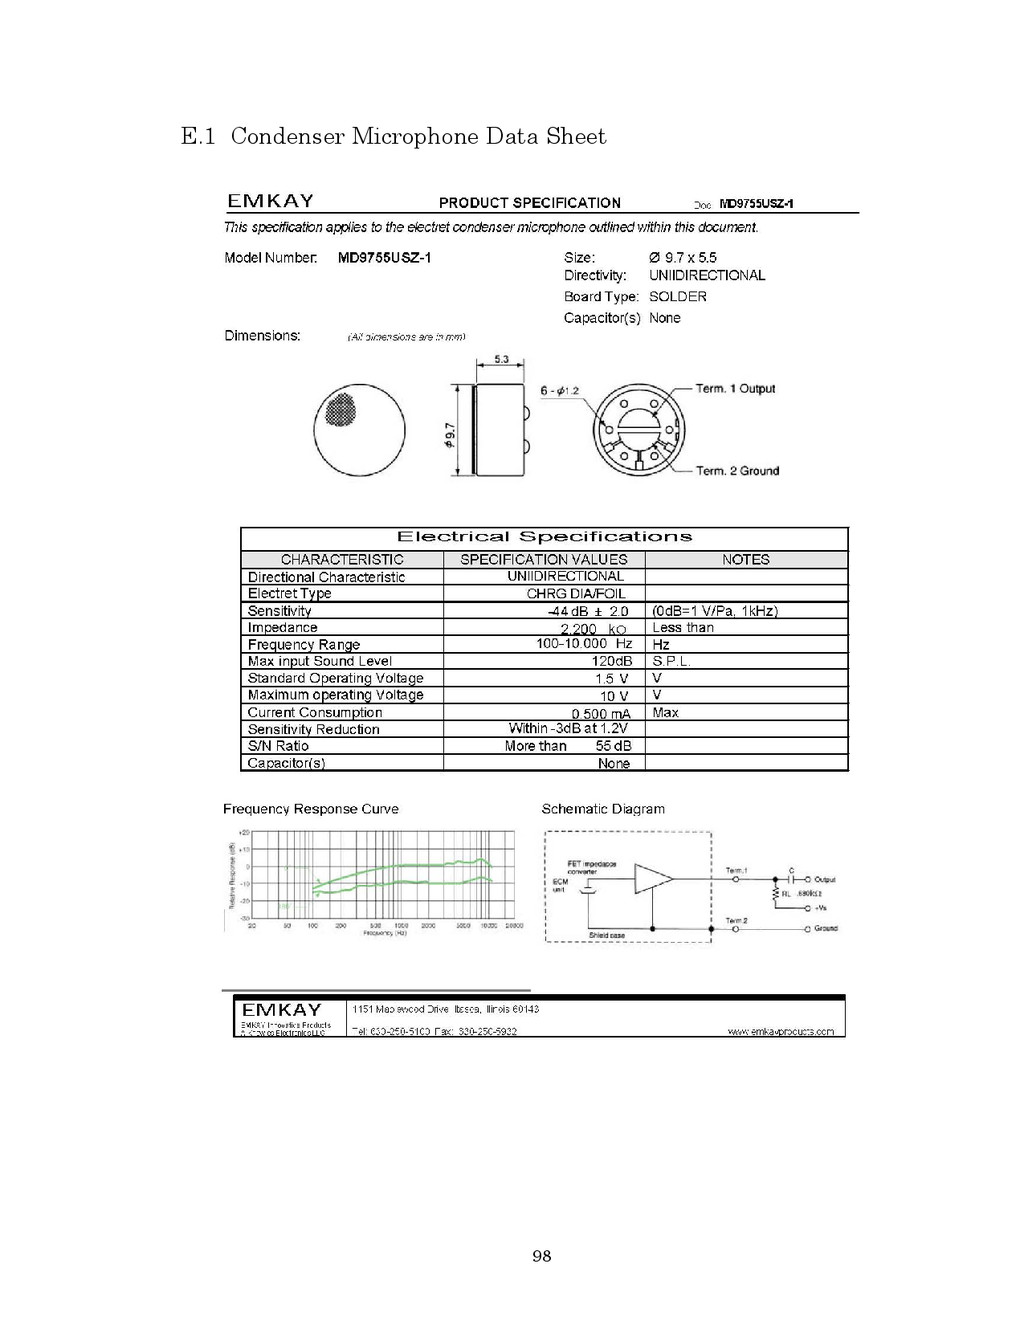 98 E.1 Condenser Microphone Data Sheet